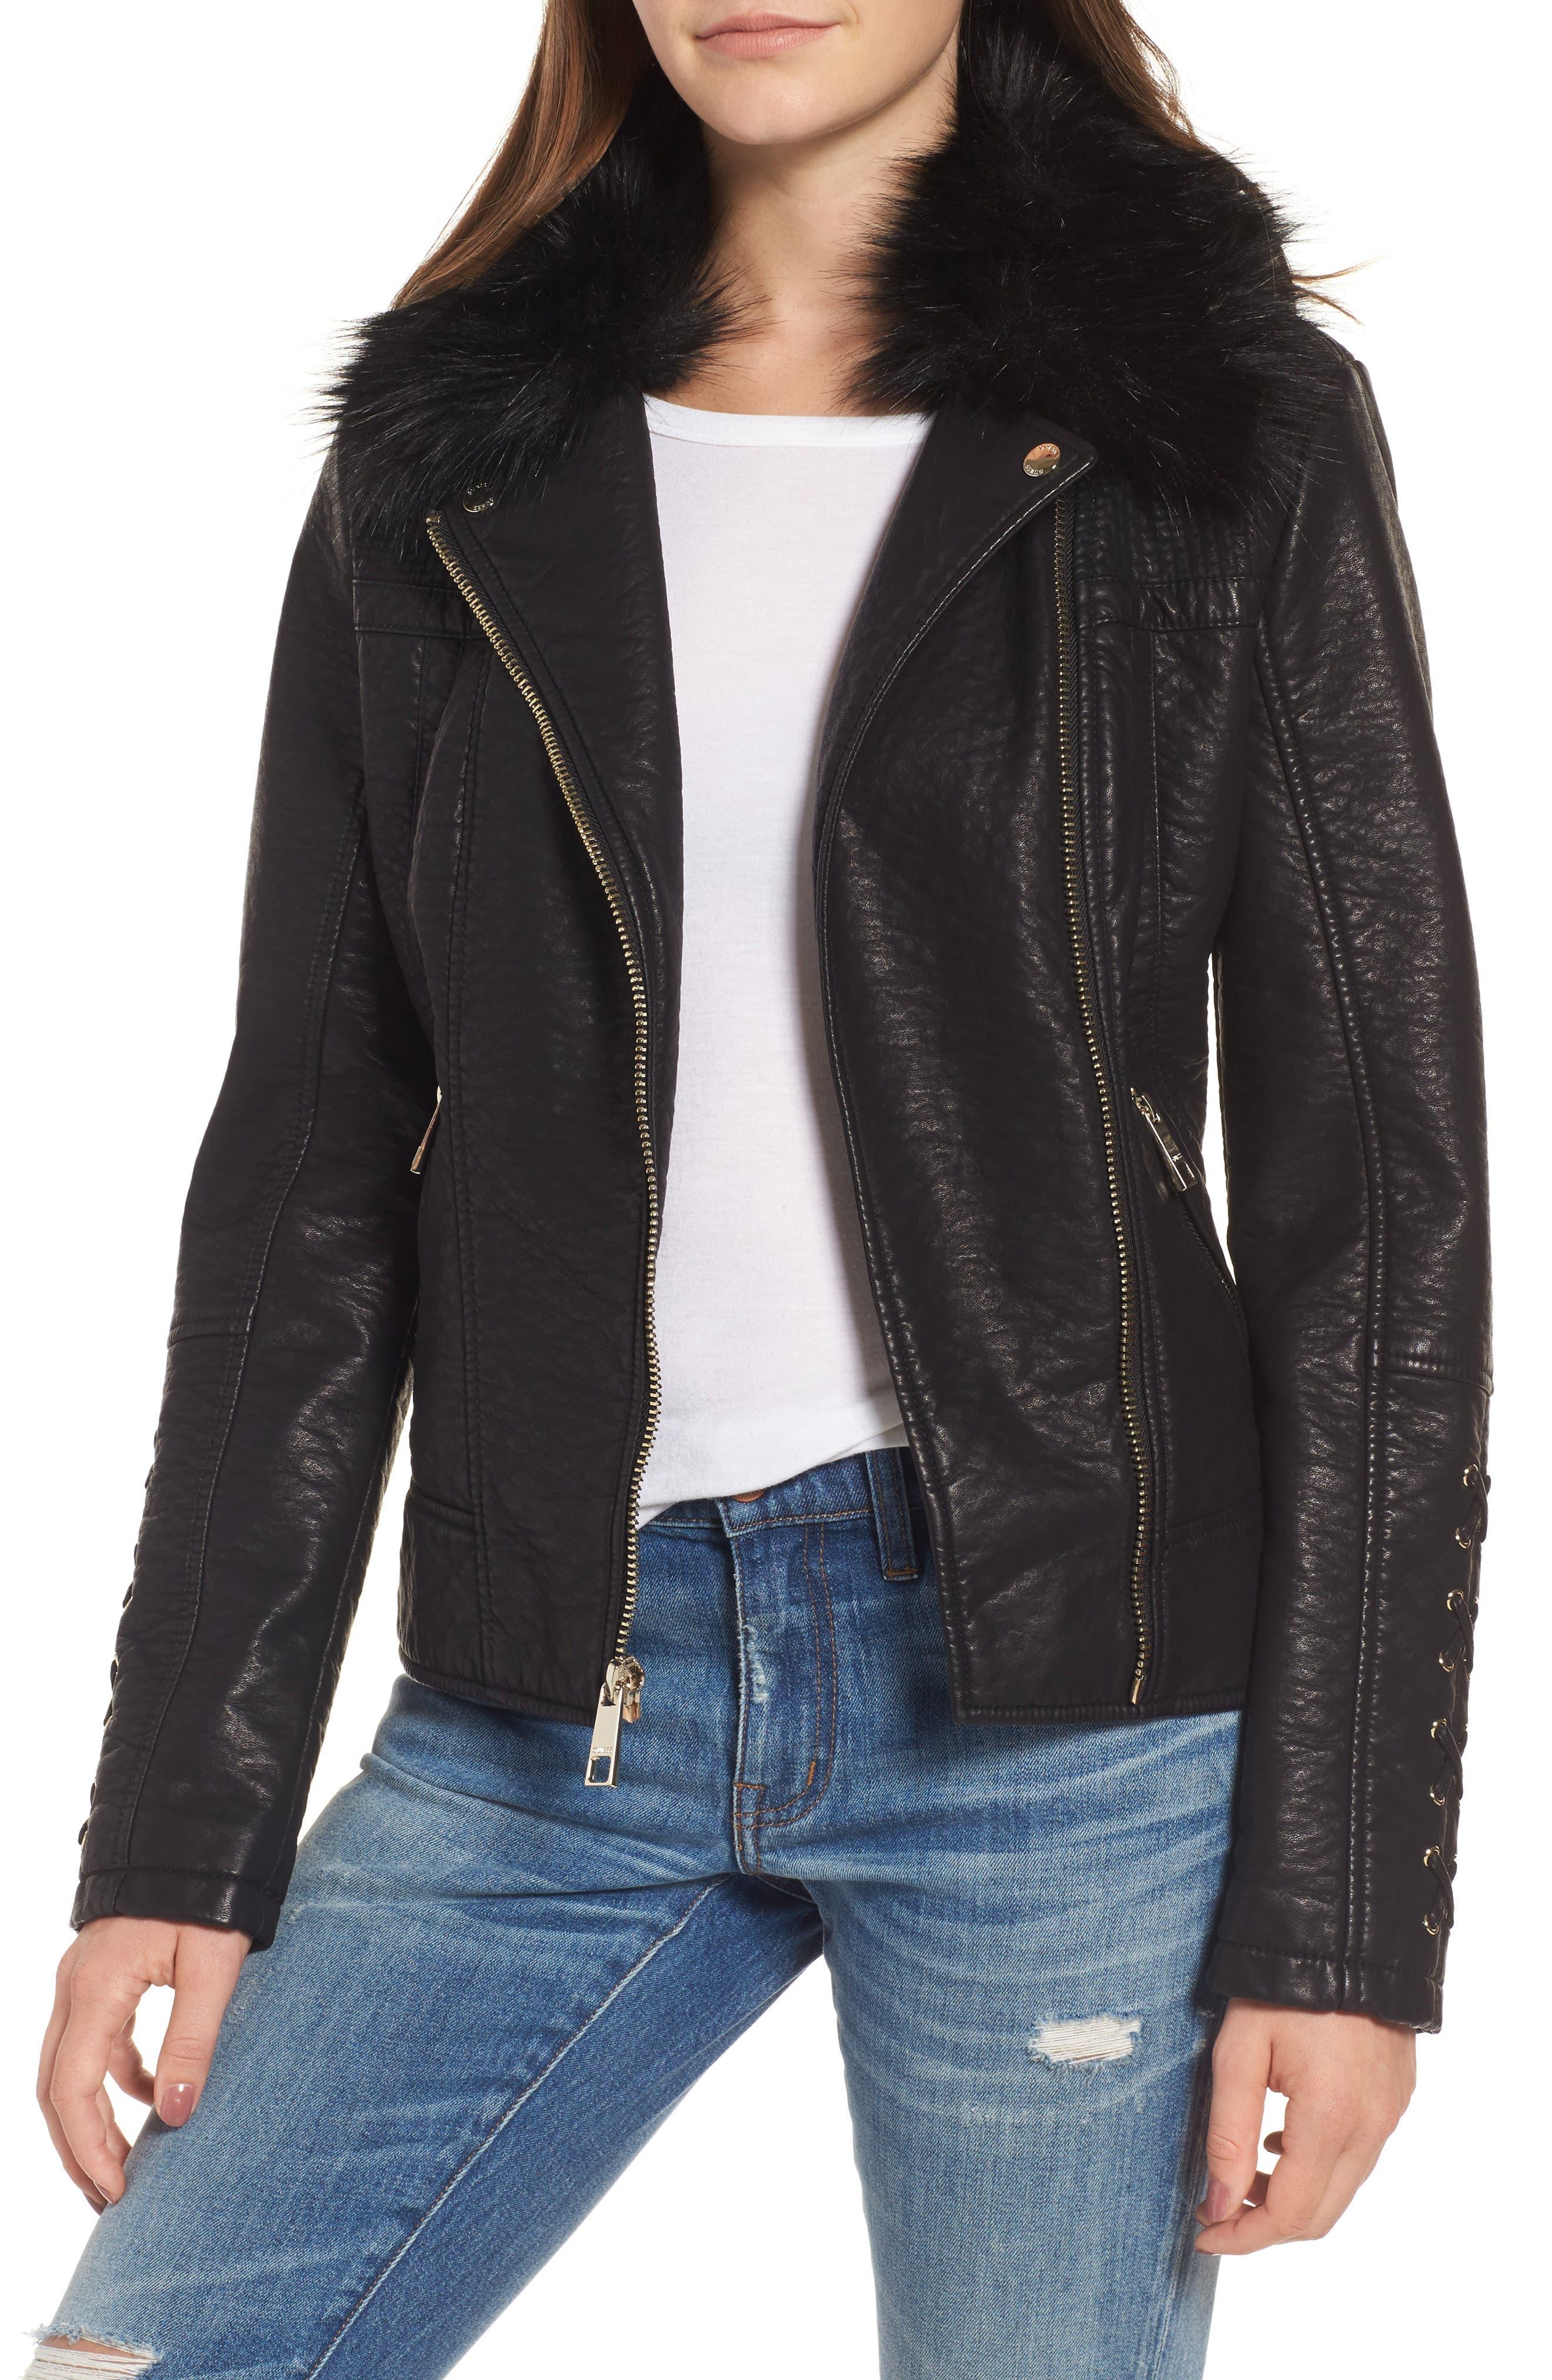 Main Image - GUESS Faux Fur Collar Jacket